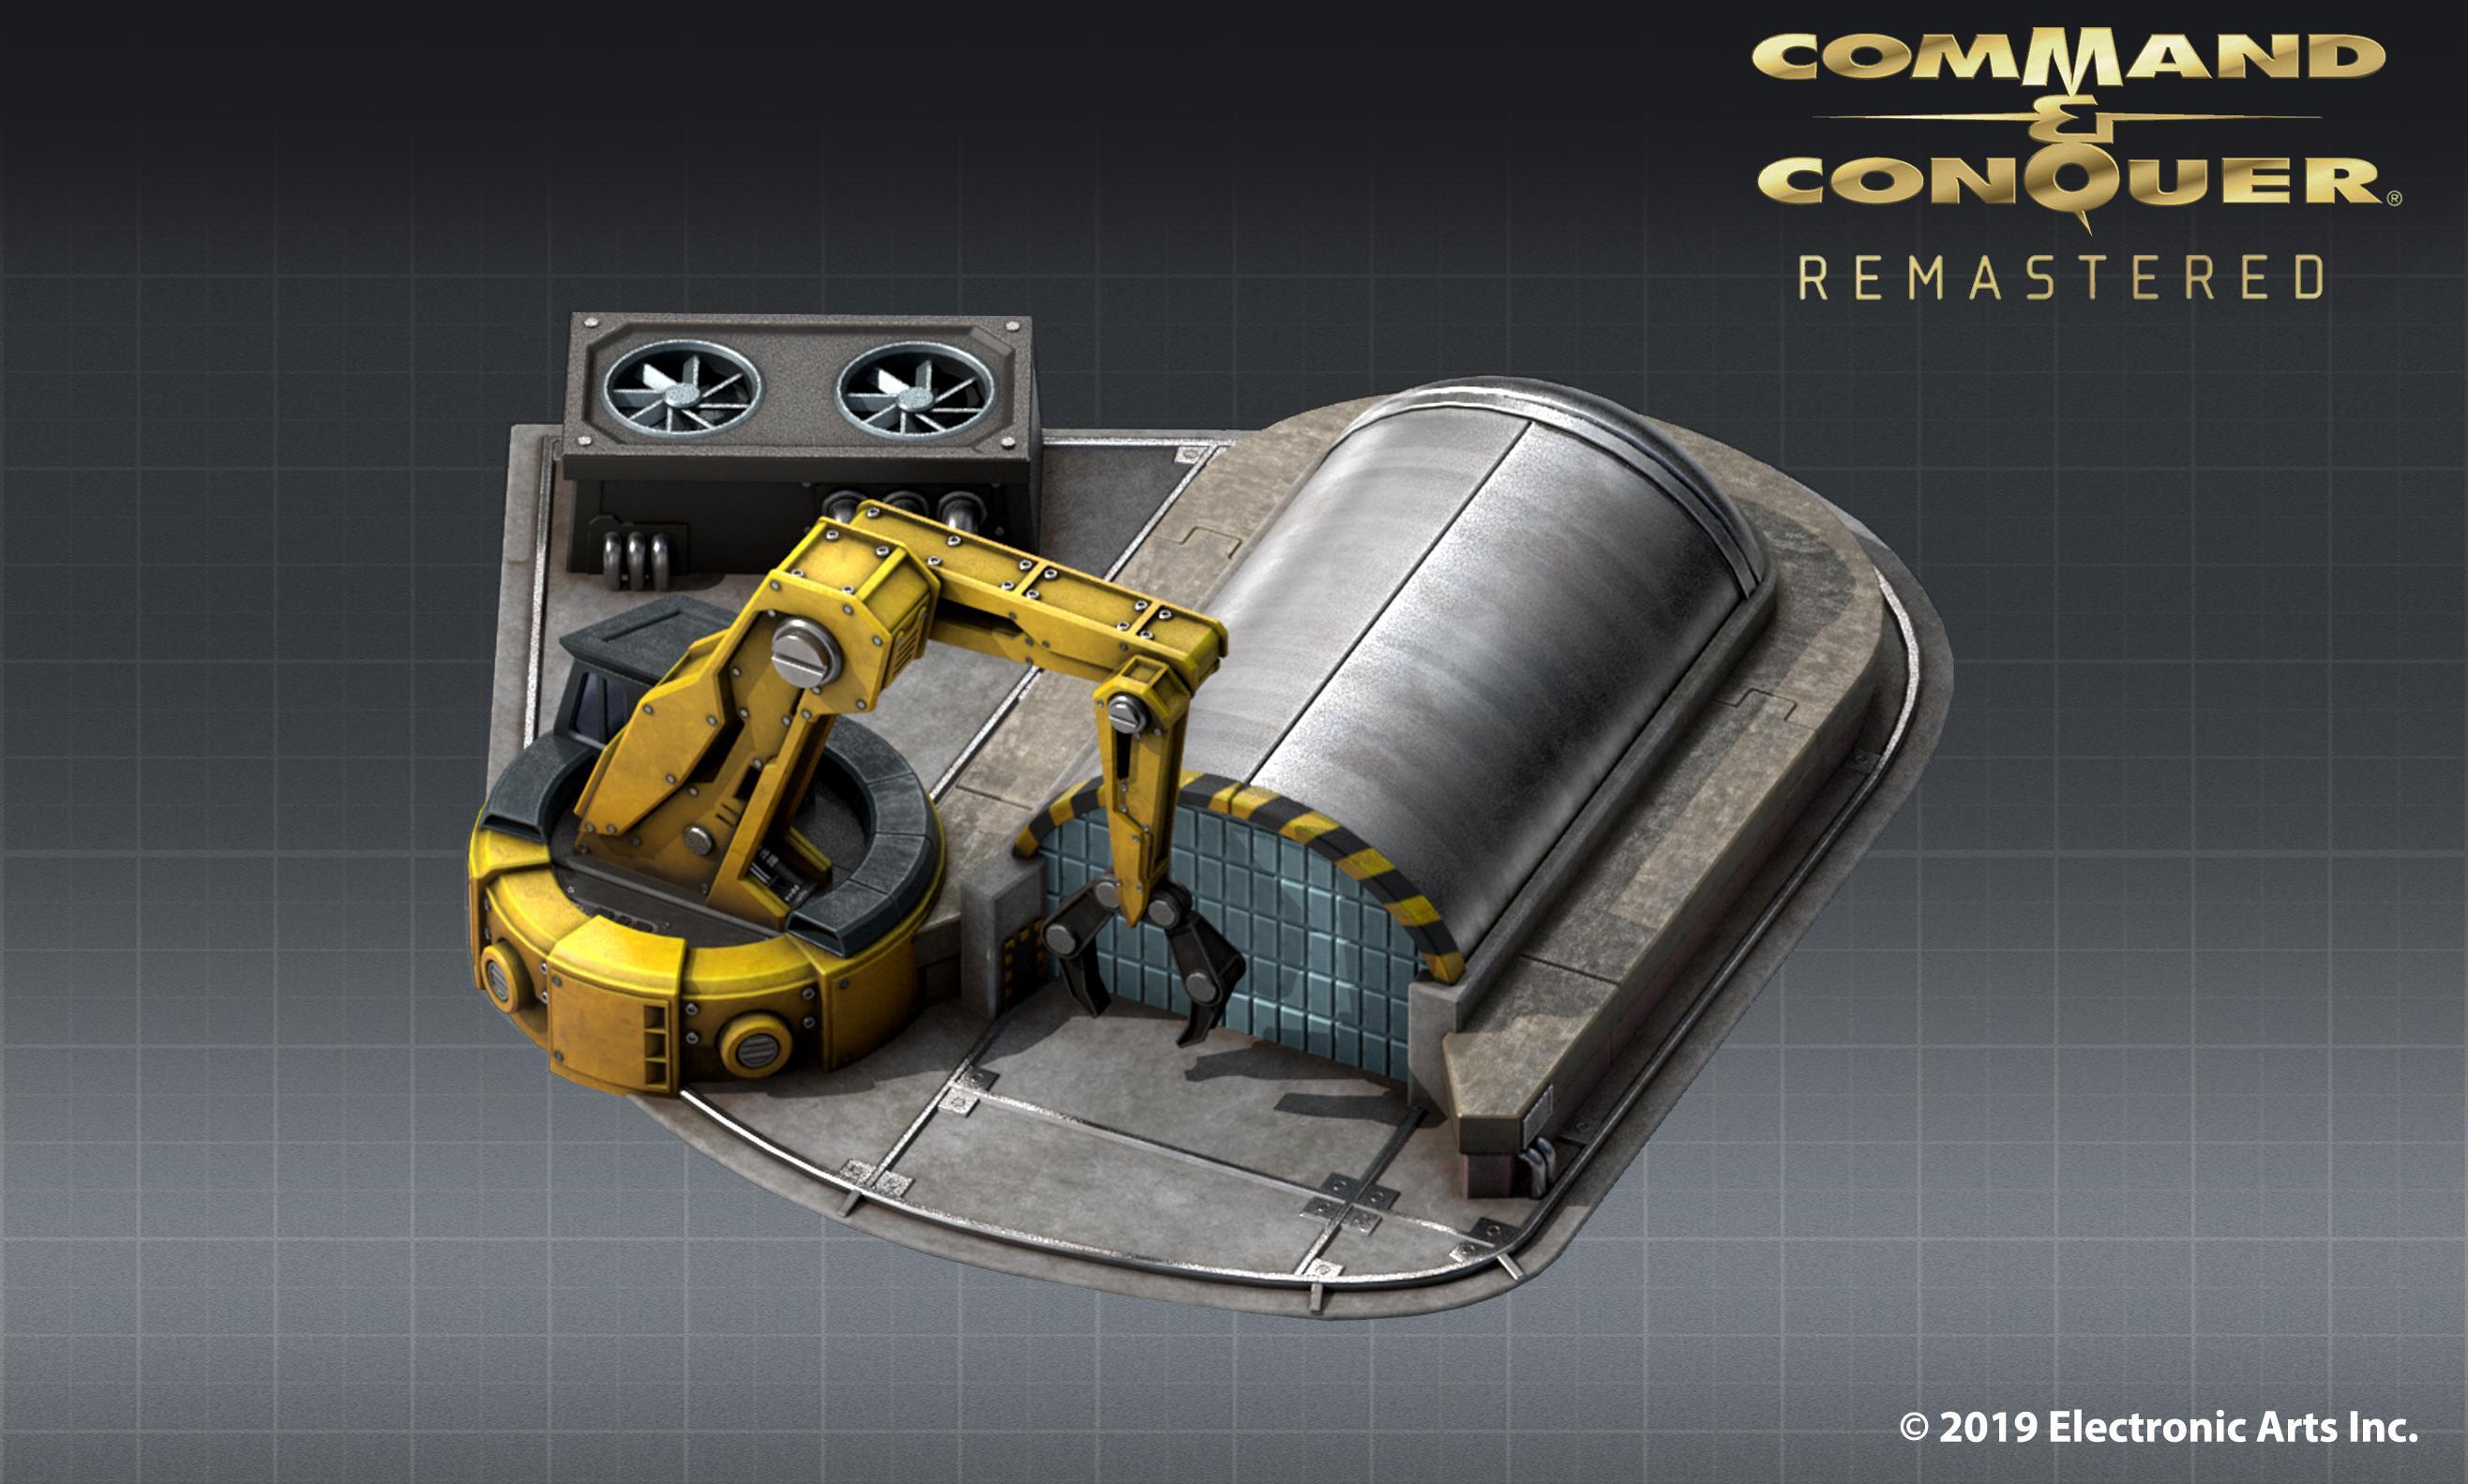 http://image.jeuxvideo.com/medias/155567/1555667950-2830-artwork.jpg